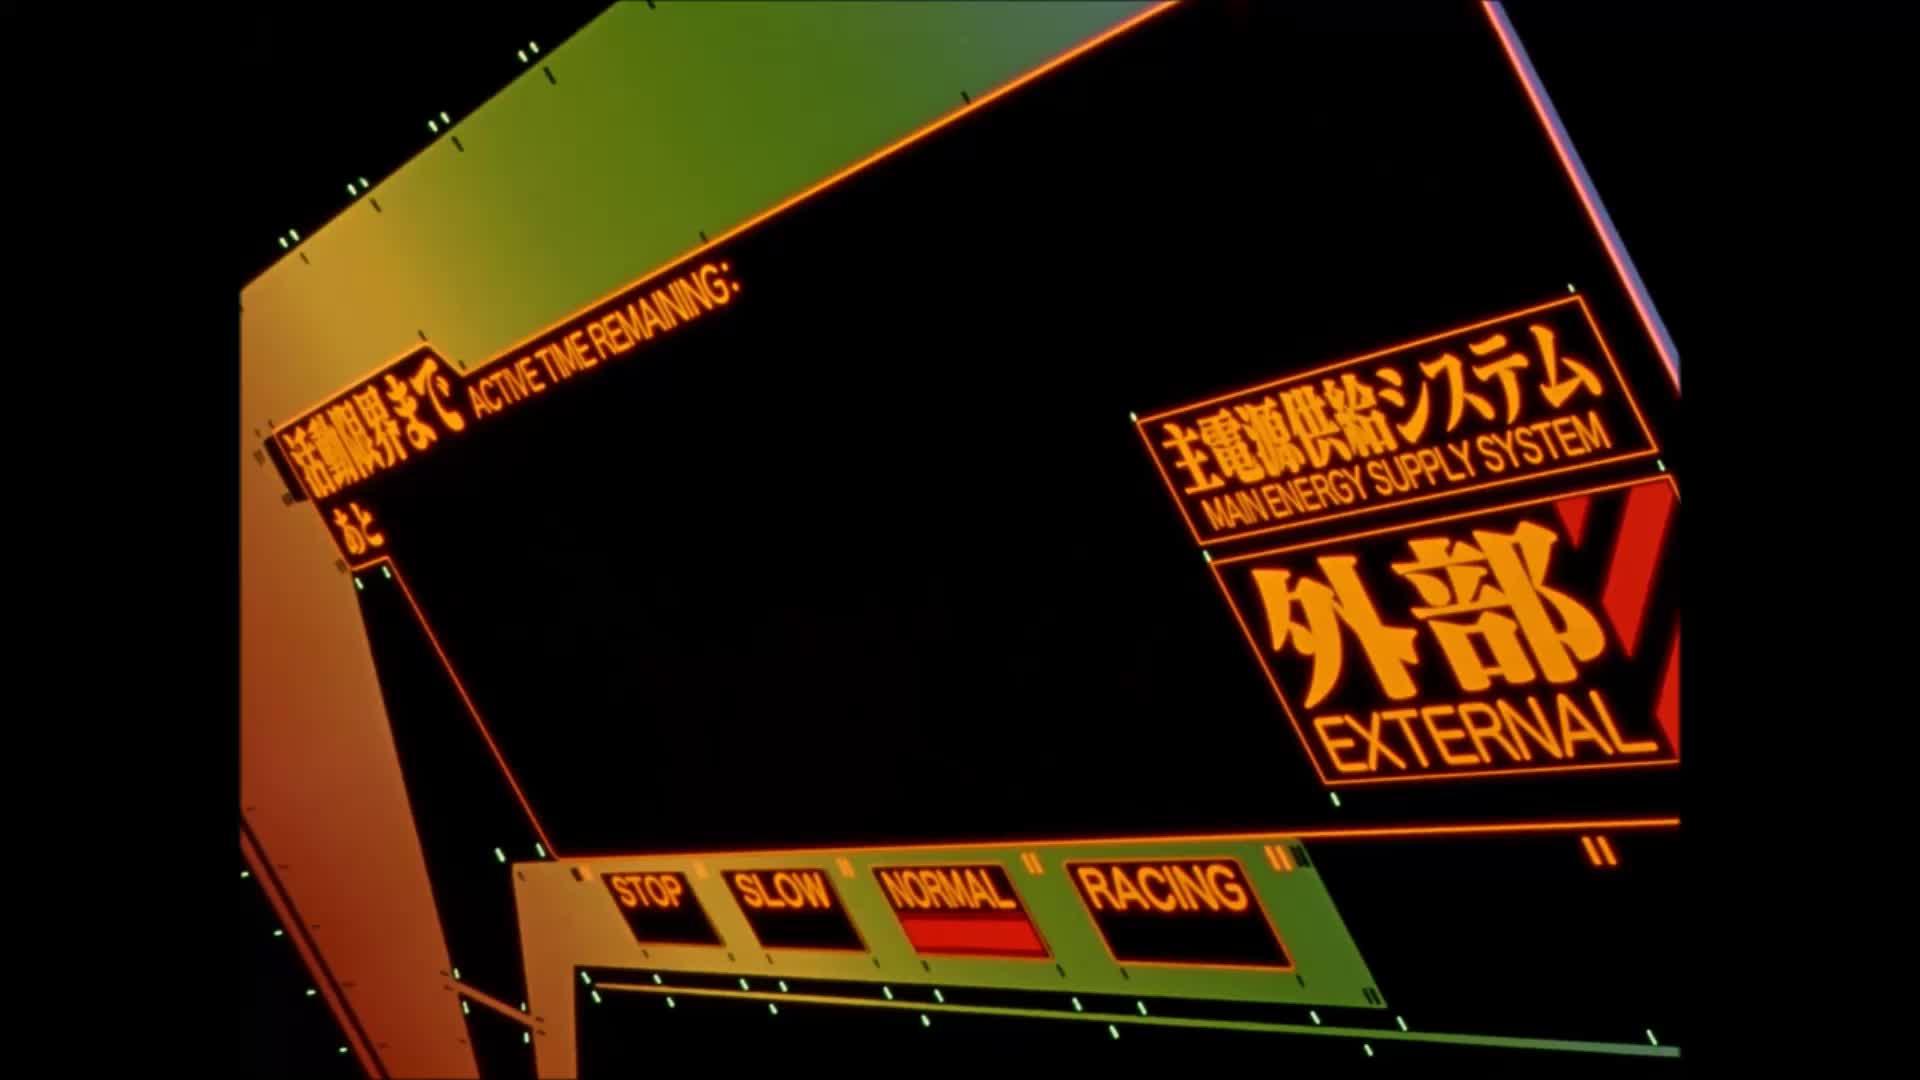 Anime, Evangelion, evangelion units battery GIFs